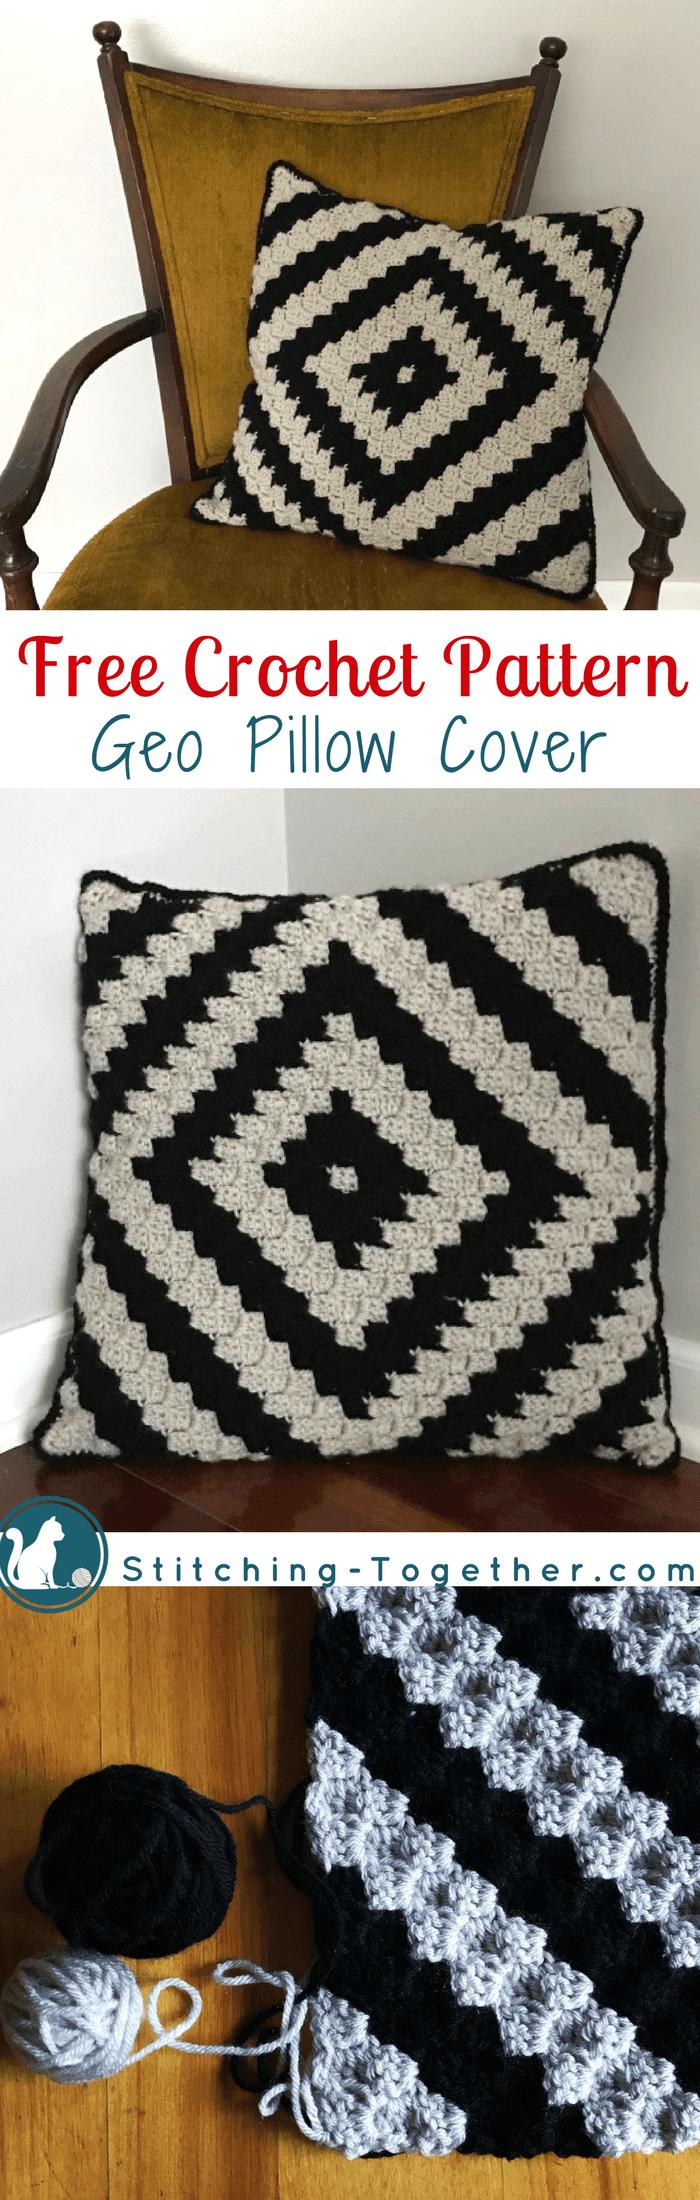 Geo Crochet Pillow Cover   Fundas de almohadas, Patrones de crochet ...